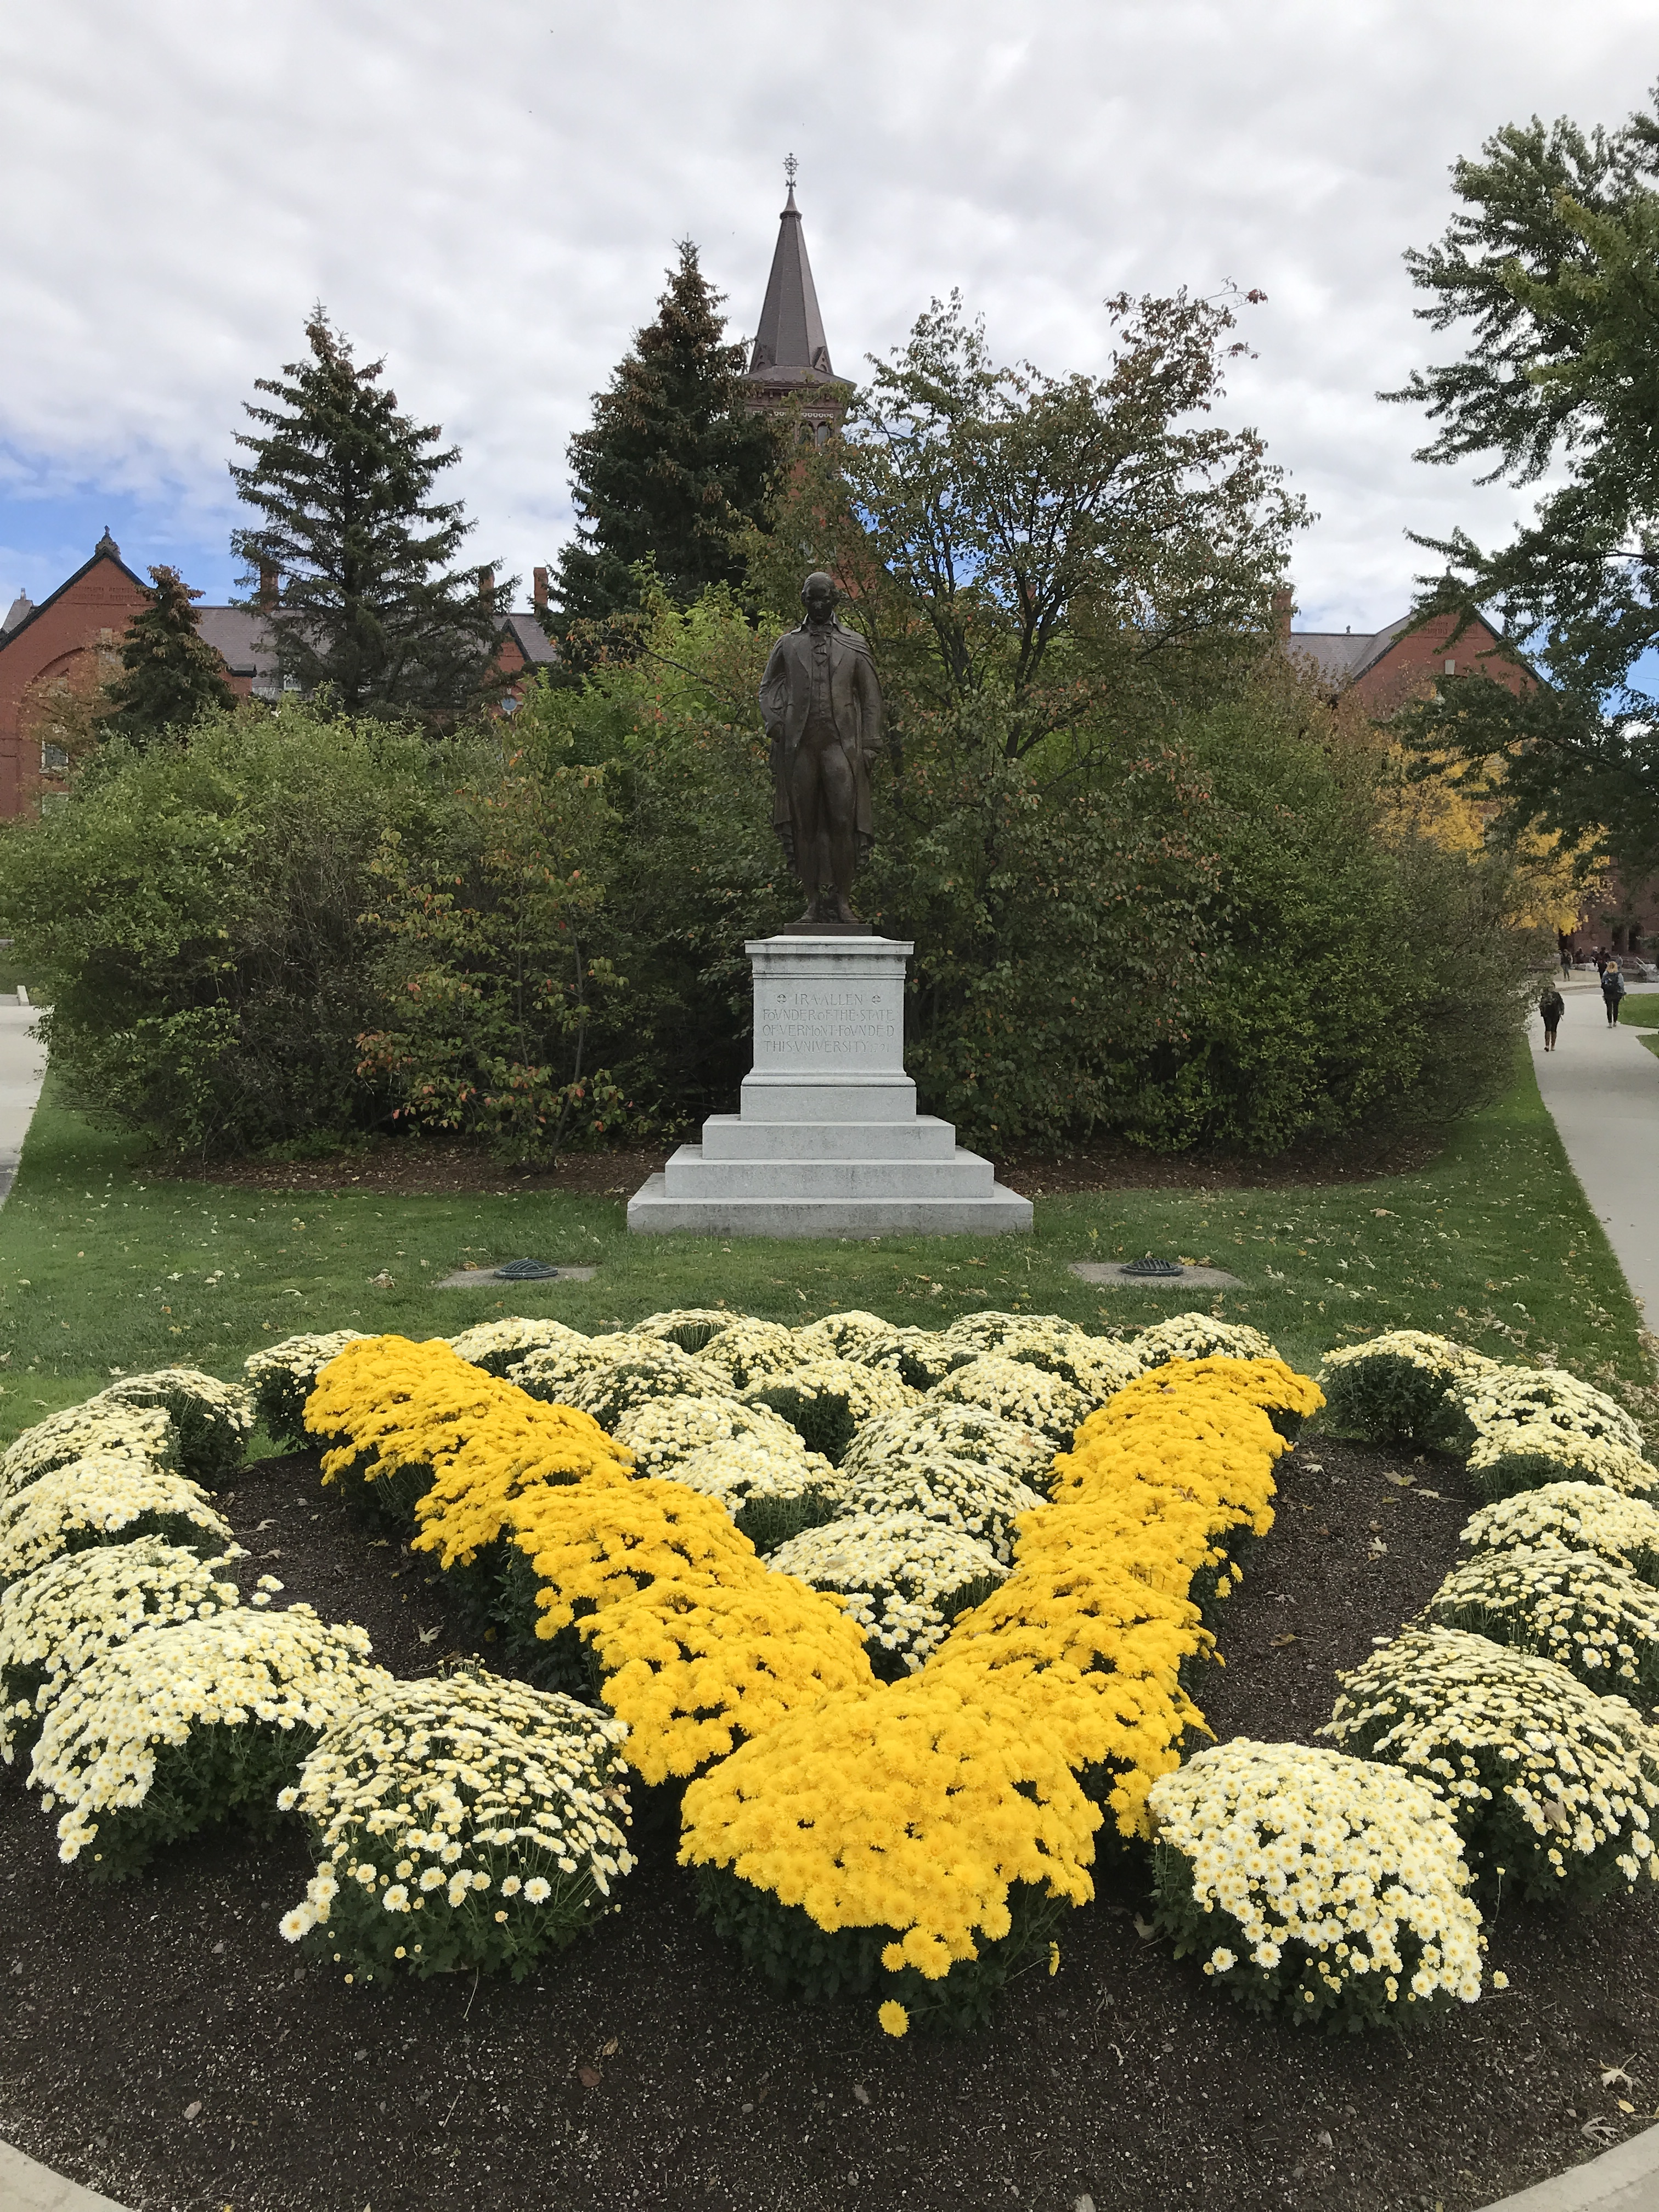 Ira Allen on the campus of the University of Vermont in Burlington